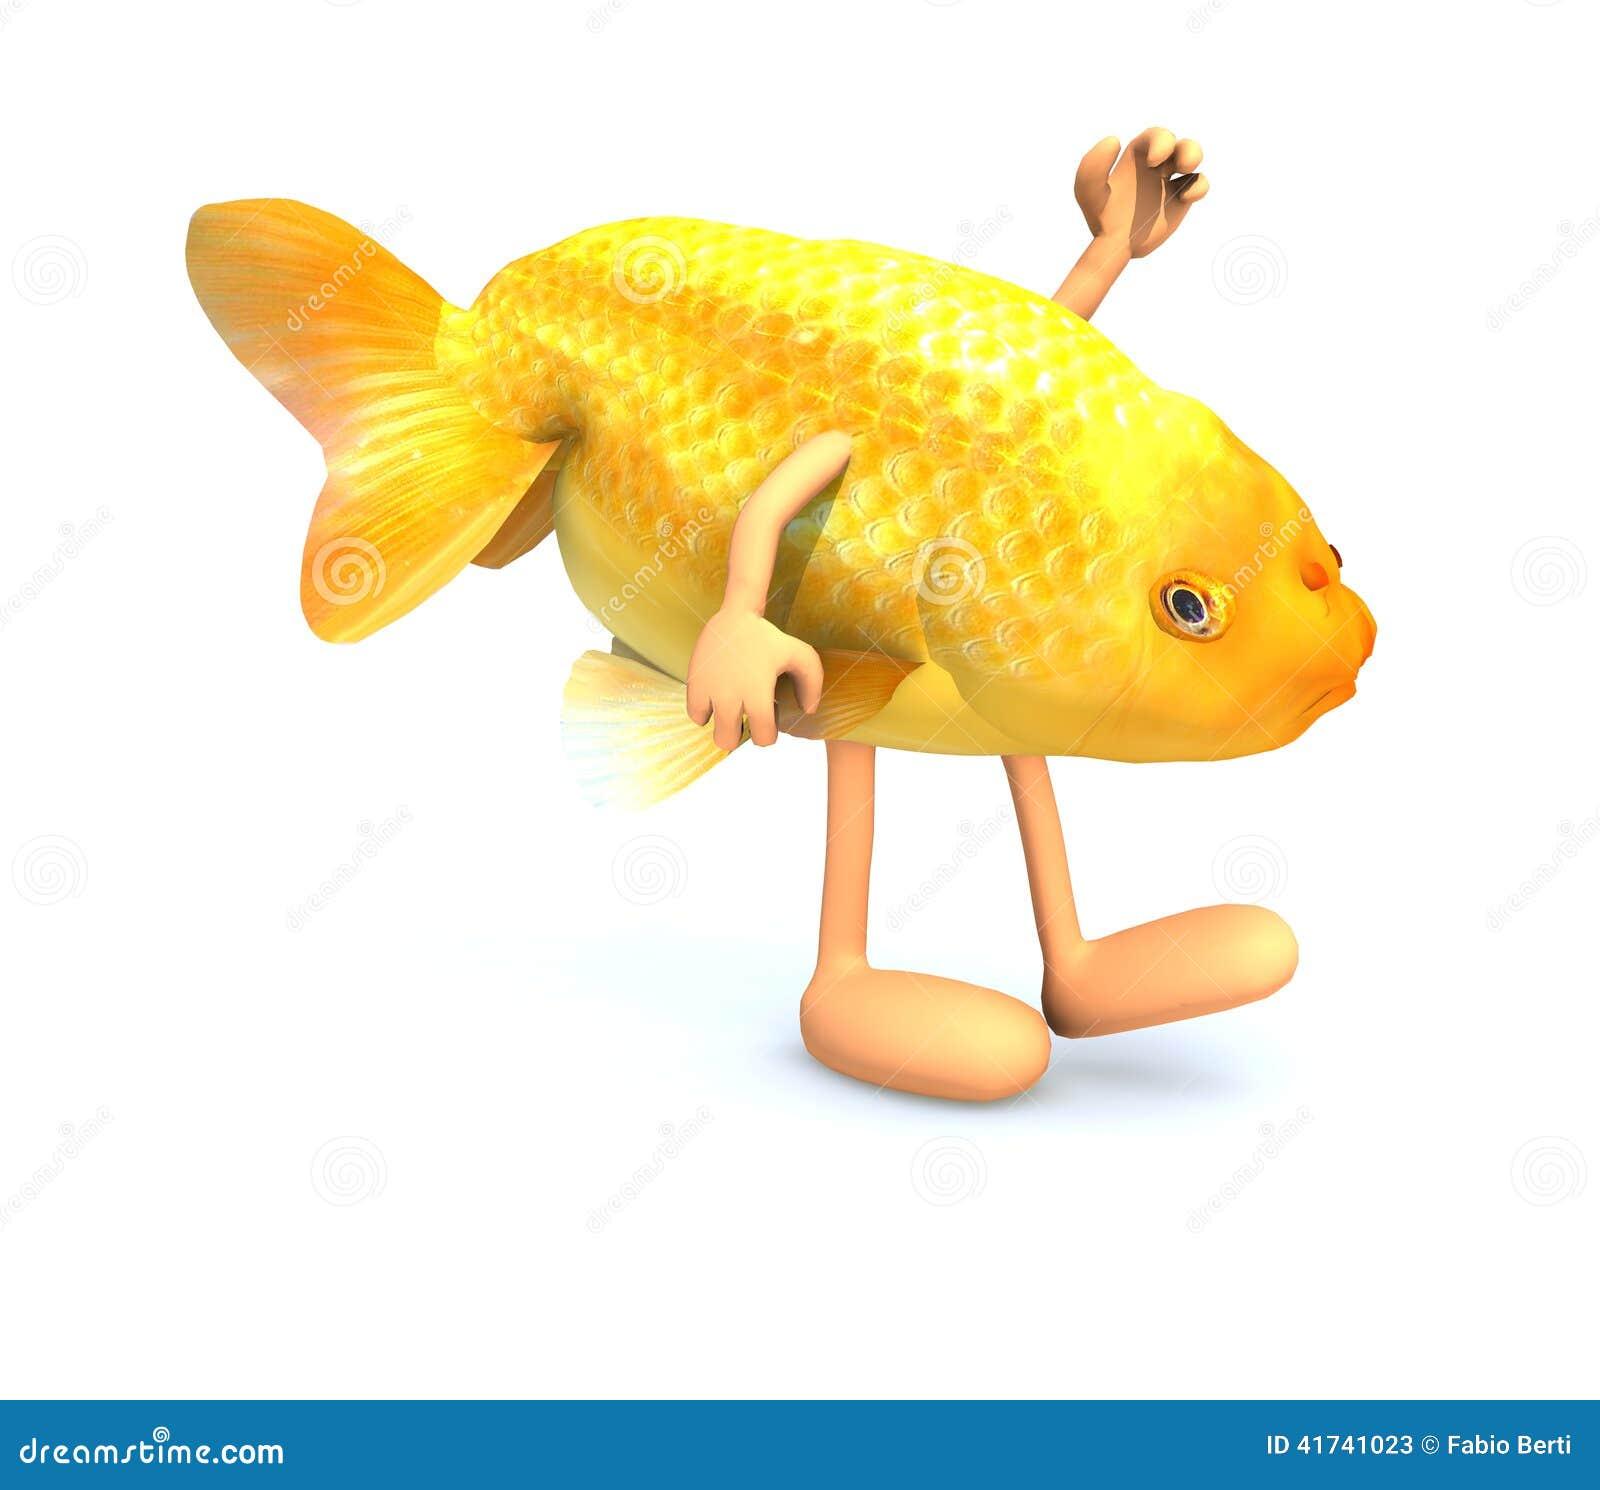 red-fish-arms-legs-walking-d-illustration-41741023.jpg